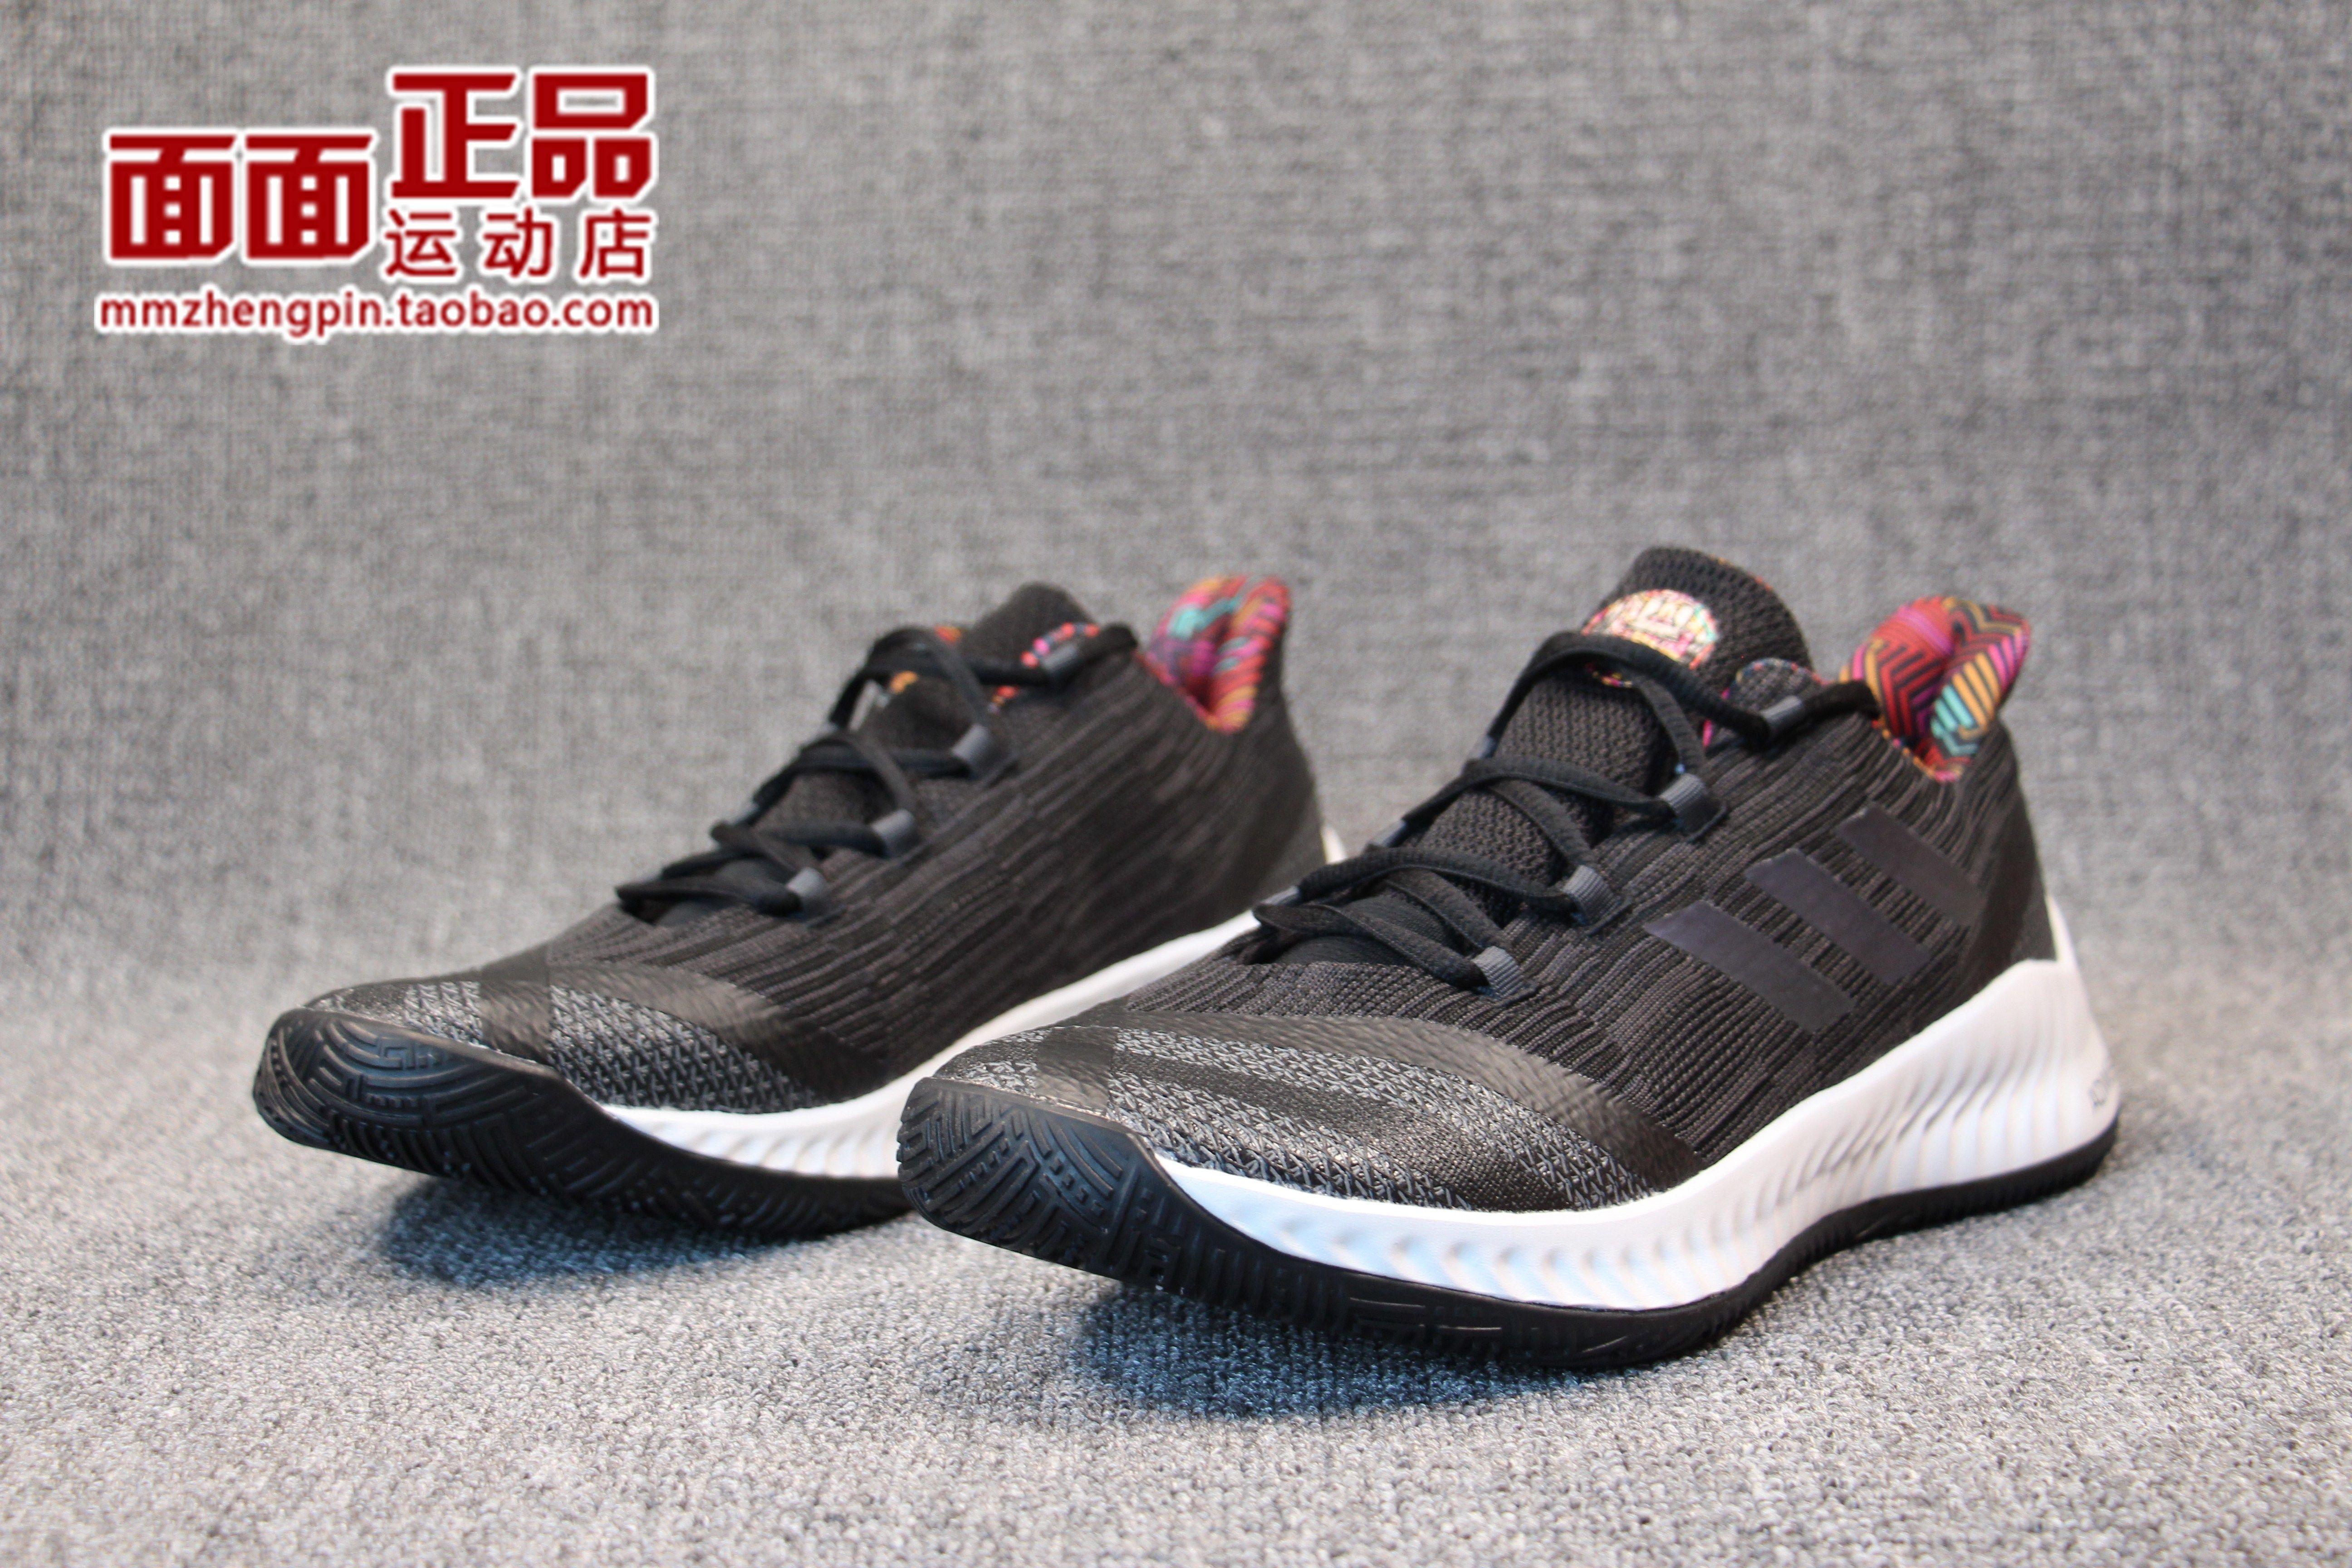 ADIDAS Harden B/E X哈登2简版男子篮球鞋 B43802 F97248 AC7436